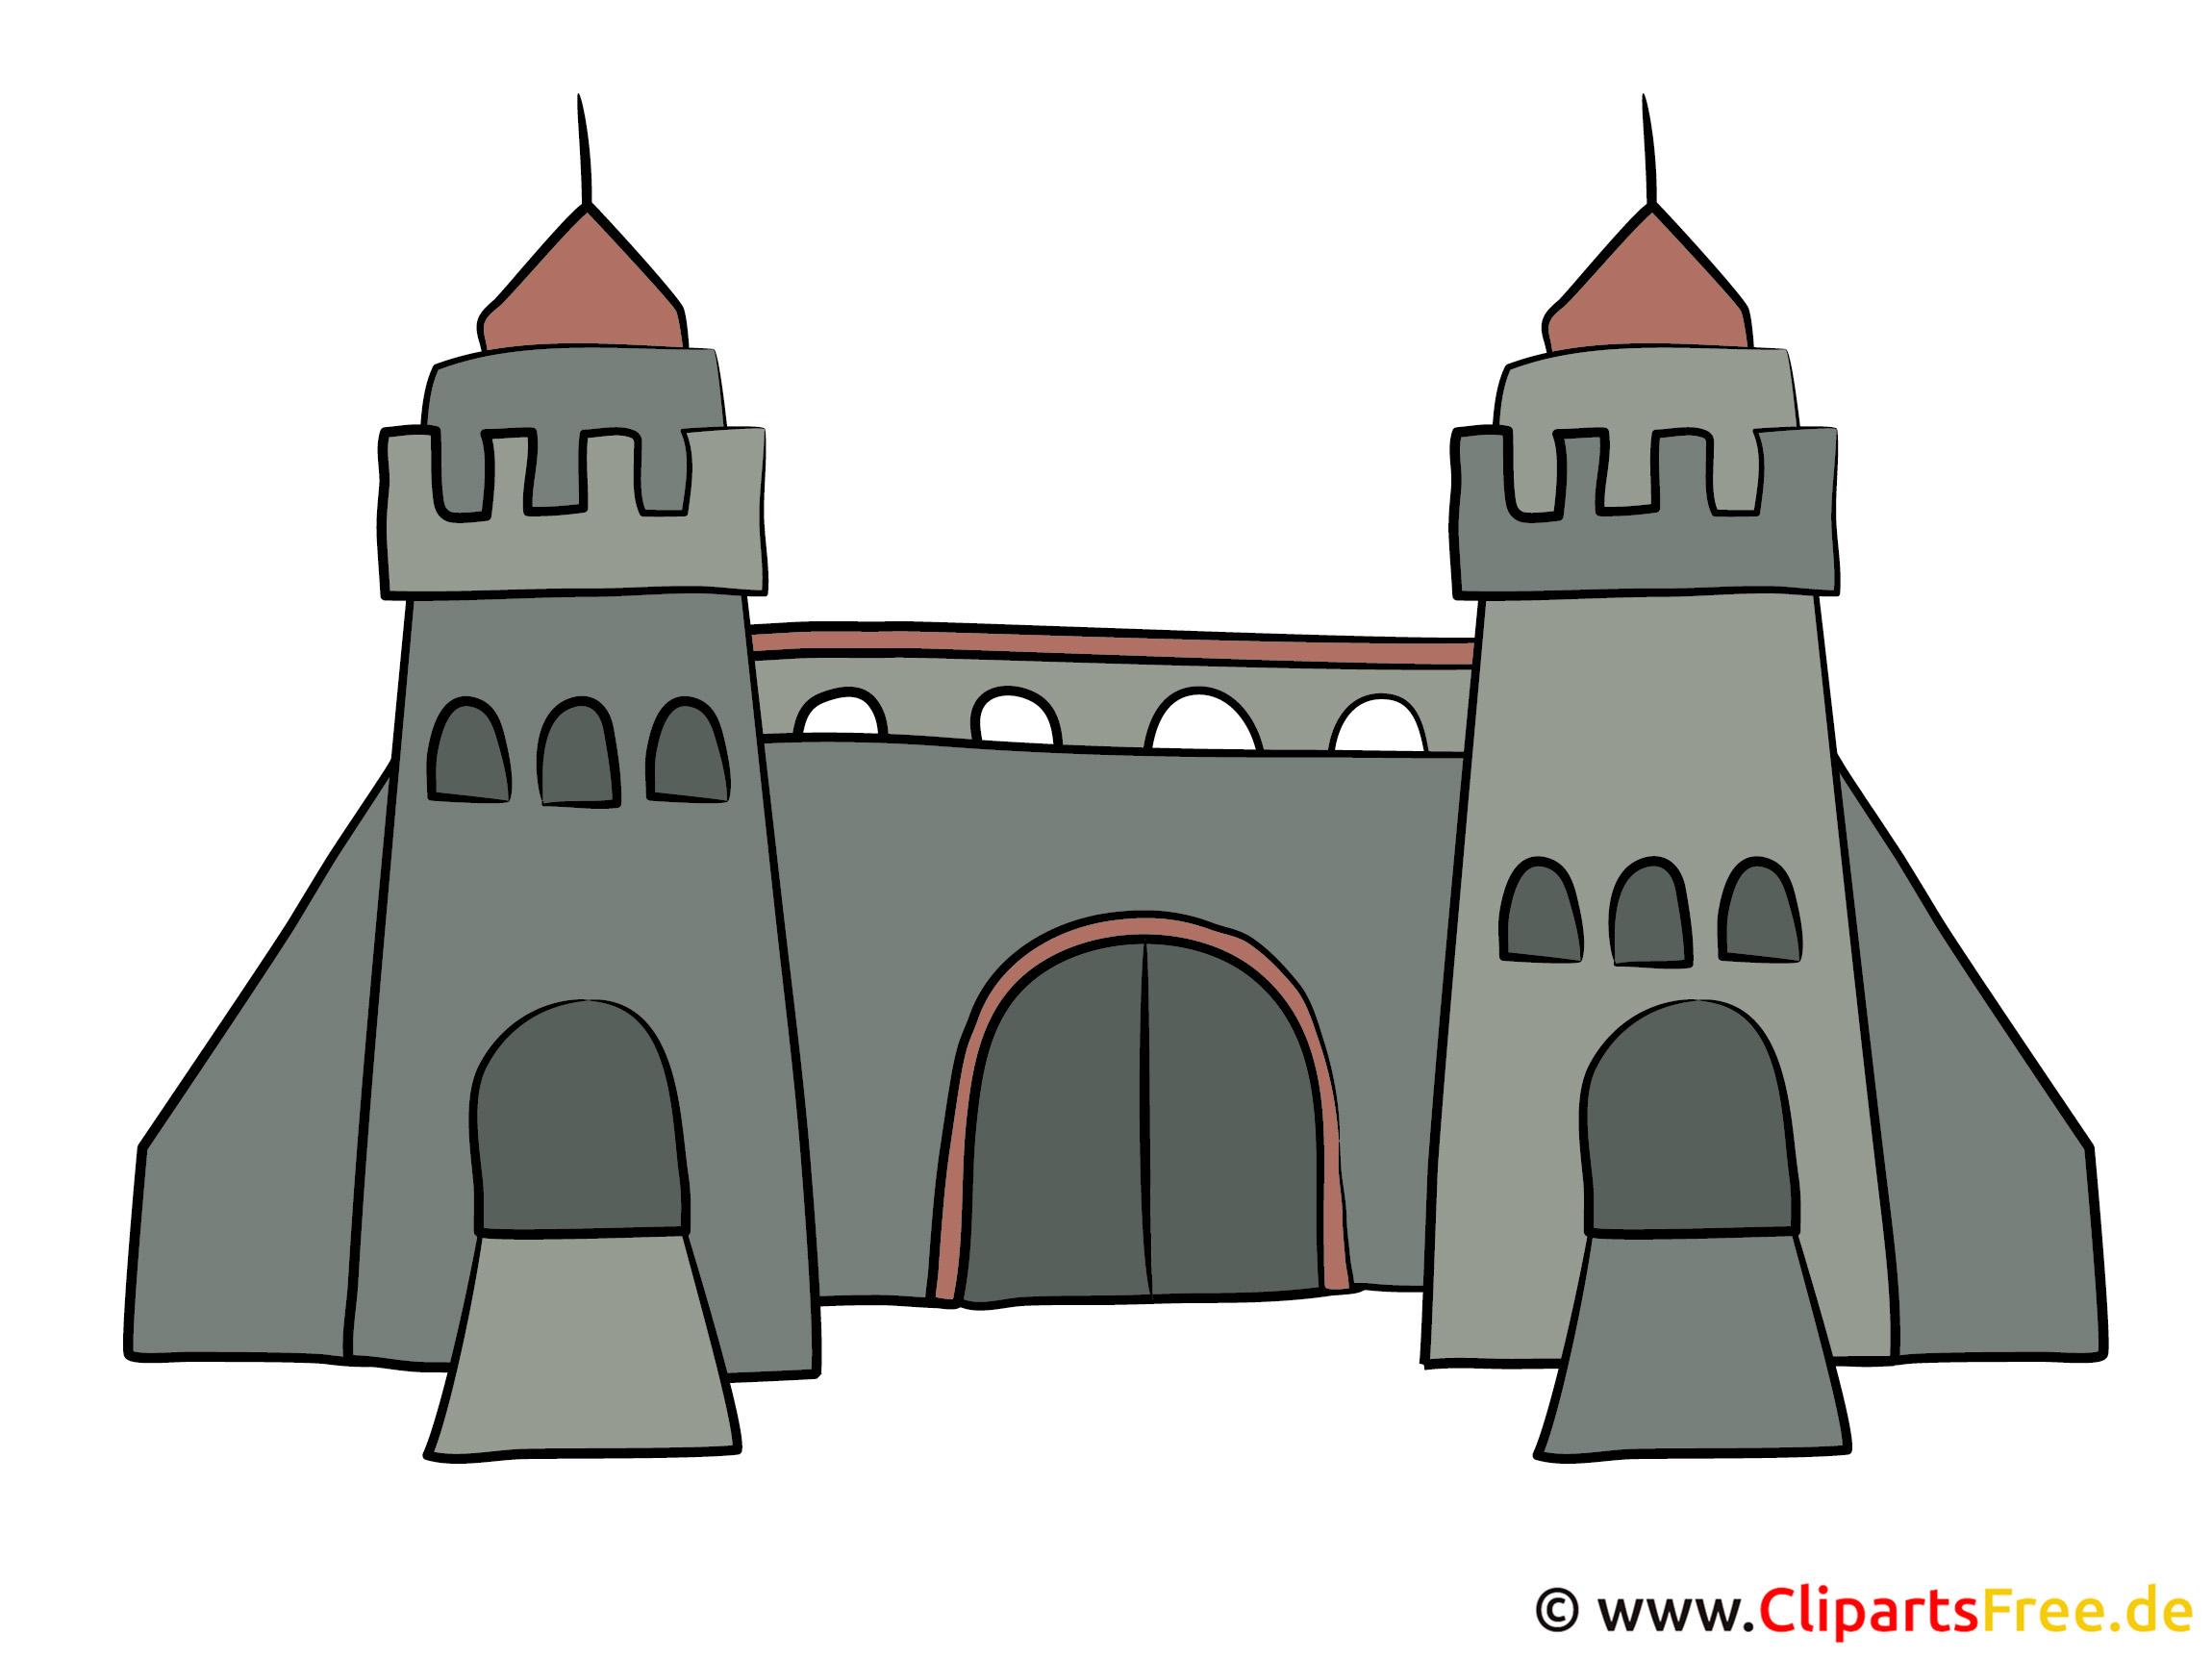 Zwei Türme Bild, Clipart, Grafik